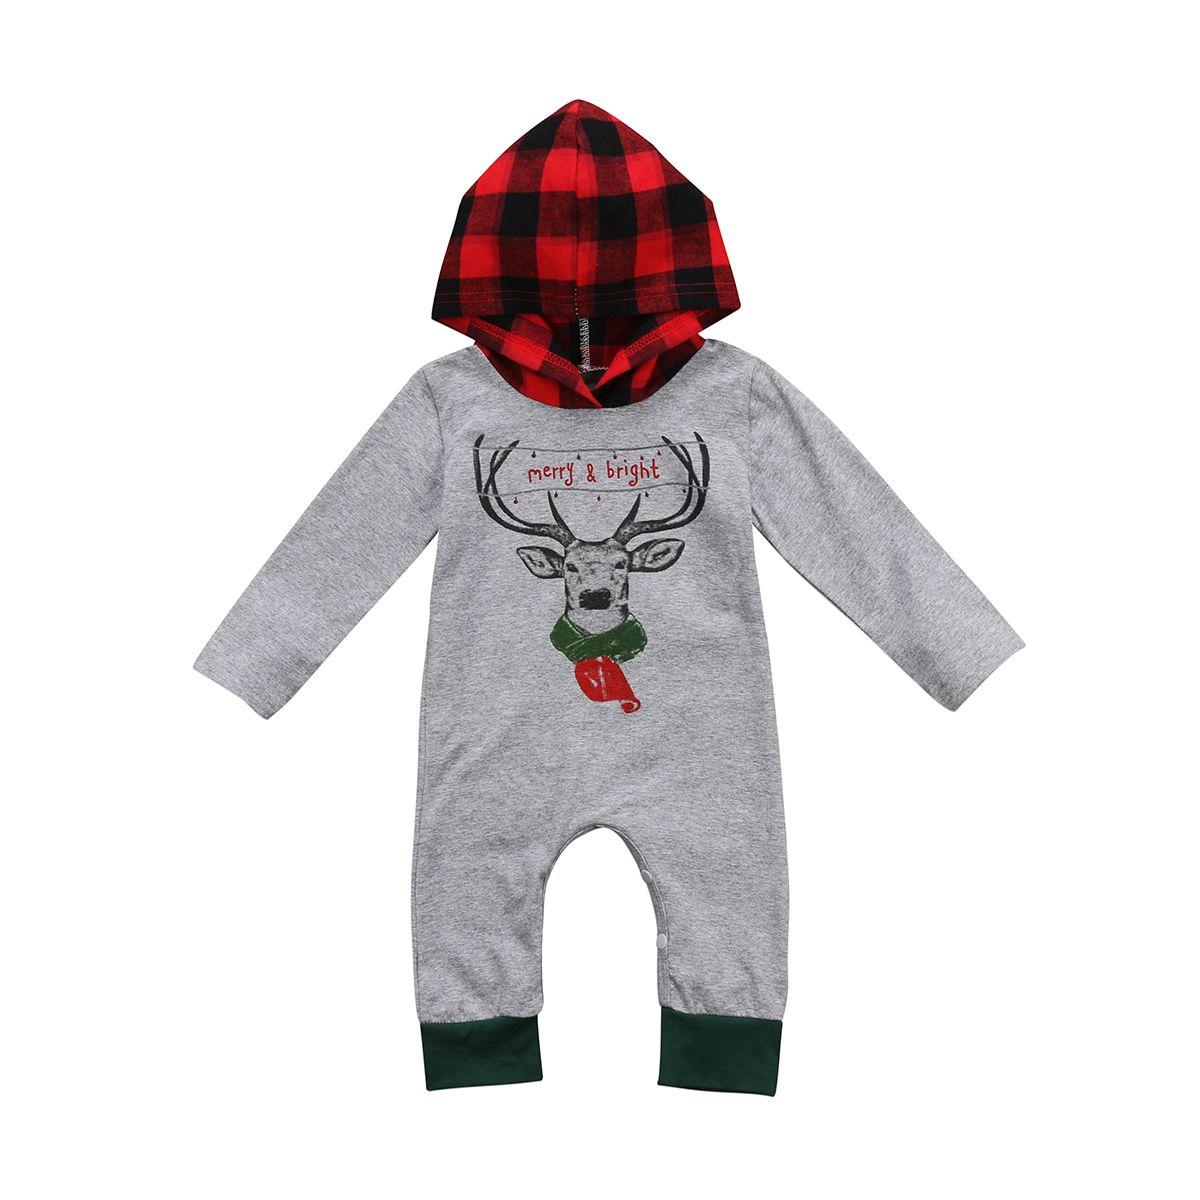 20465dd7e PUDCOCO Baby Xmas Hooded Bodysuit Cotton 0-24M Baby Boys Girls ...